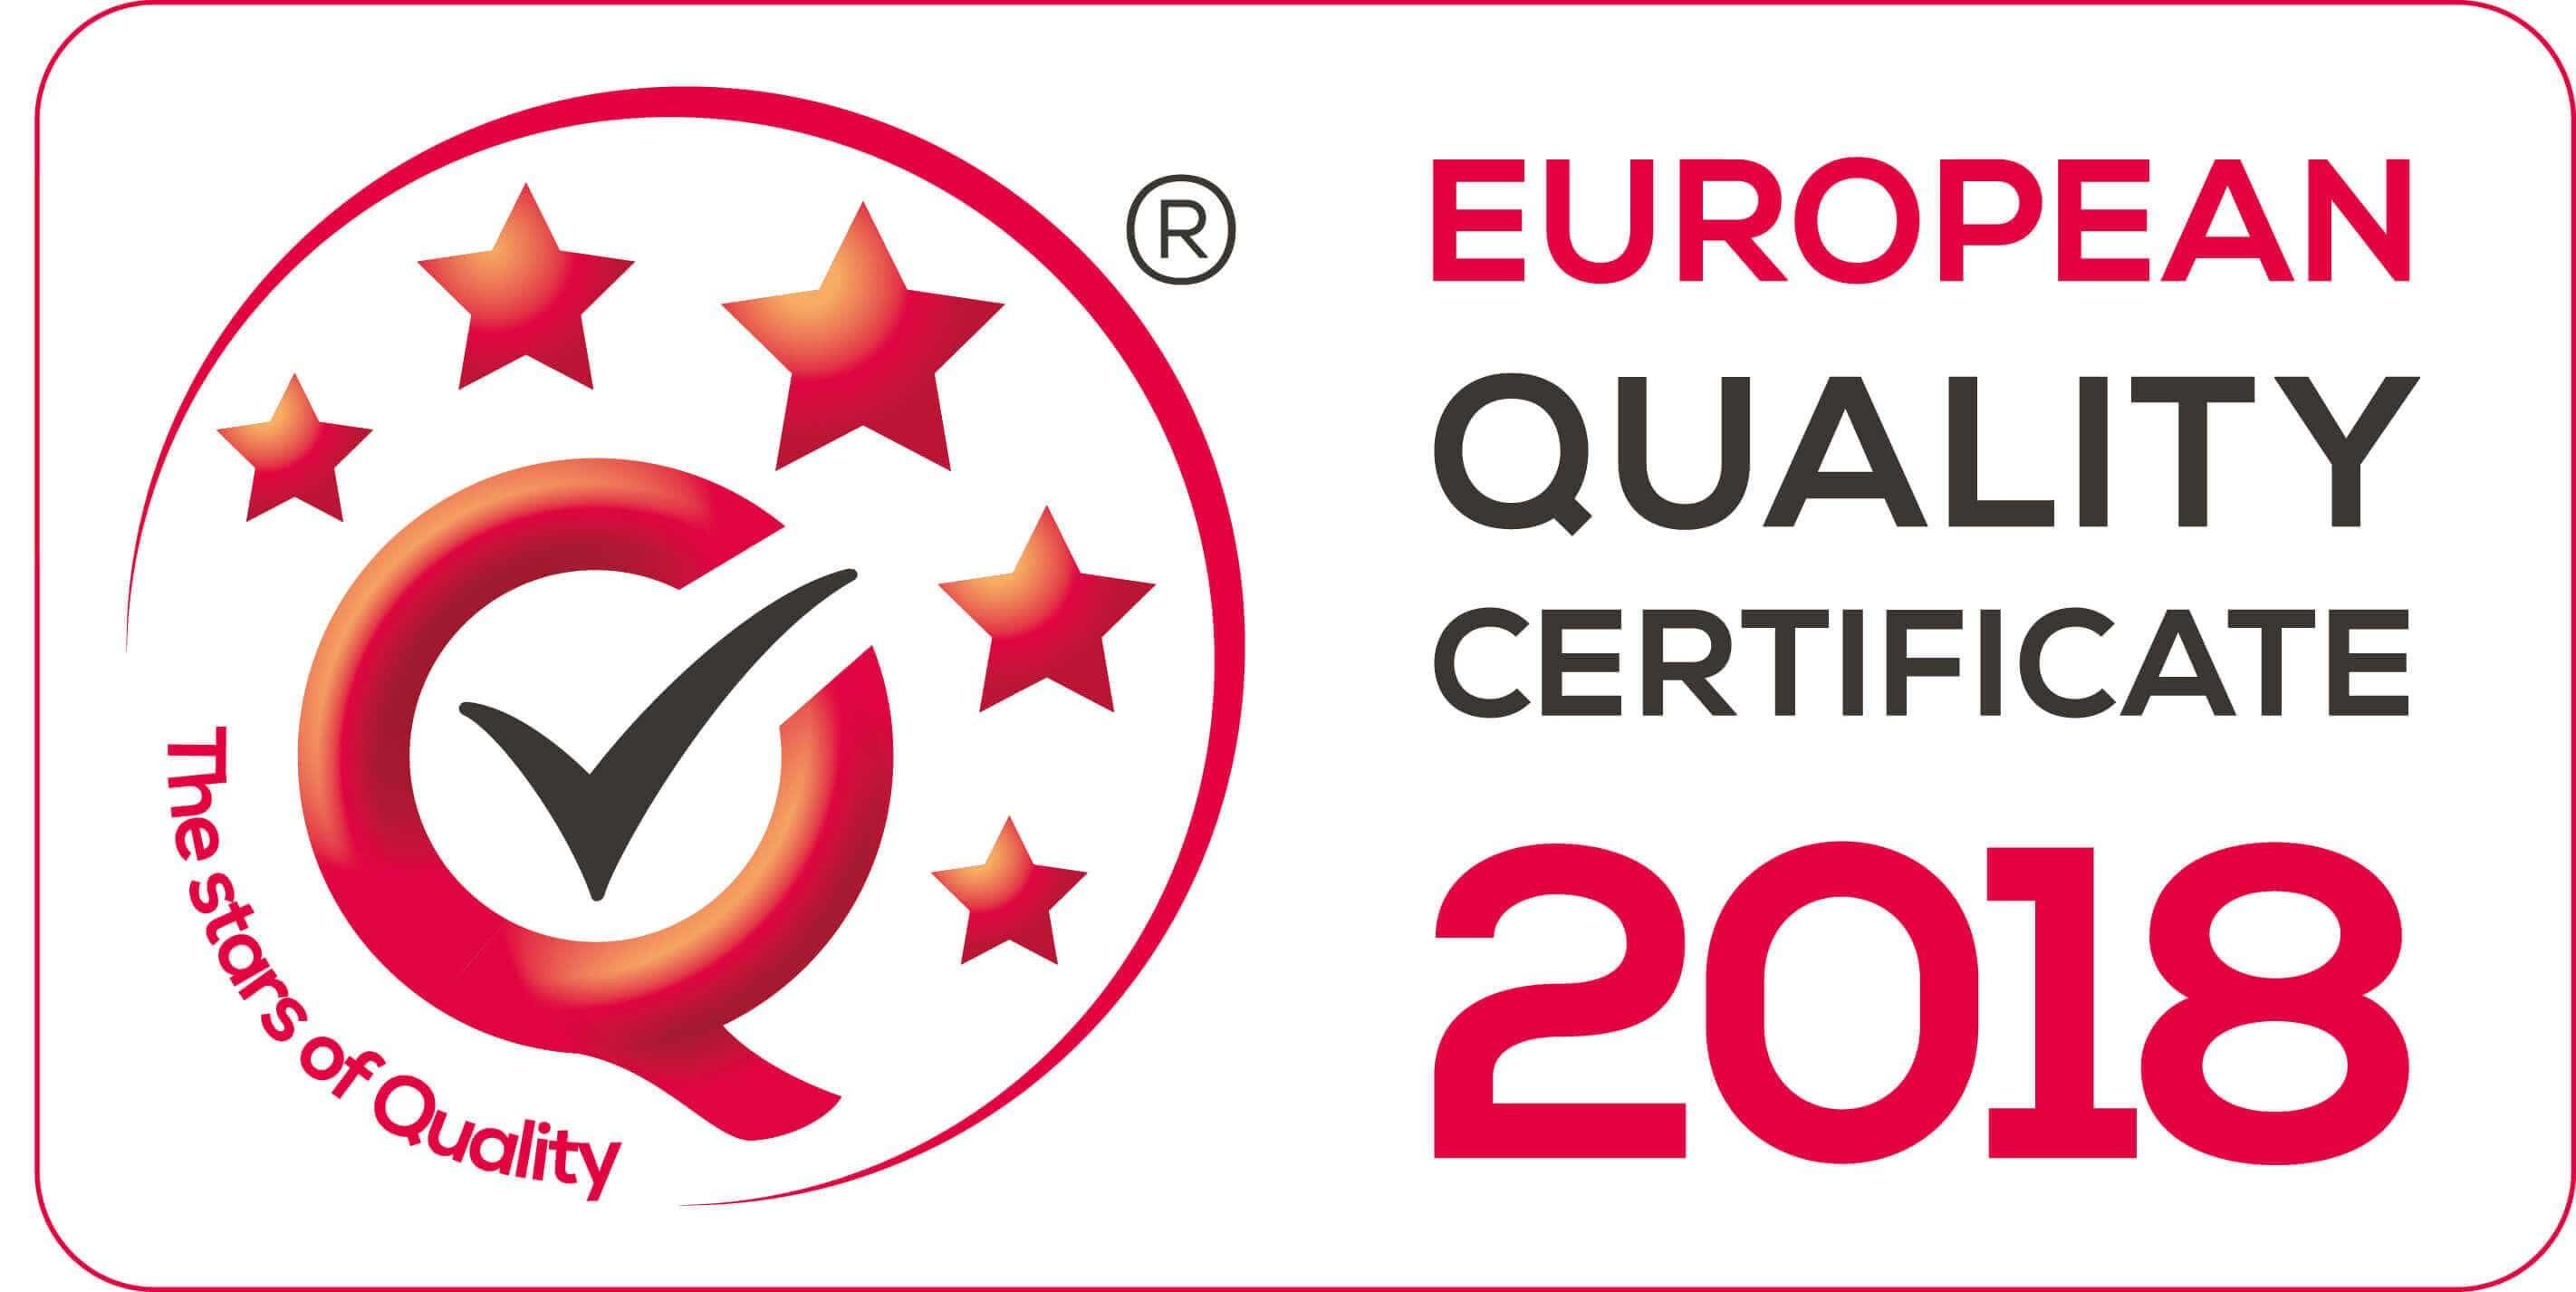 EQC 2018 en - EUROPEAN QUALITY CERTIFICATE 2018